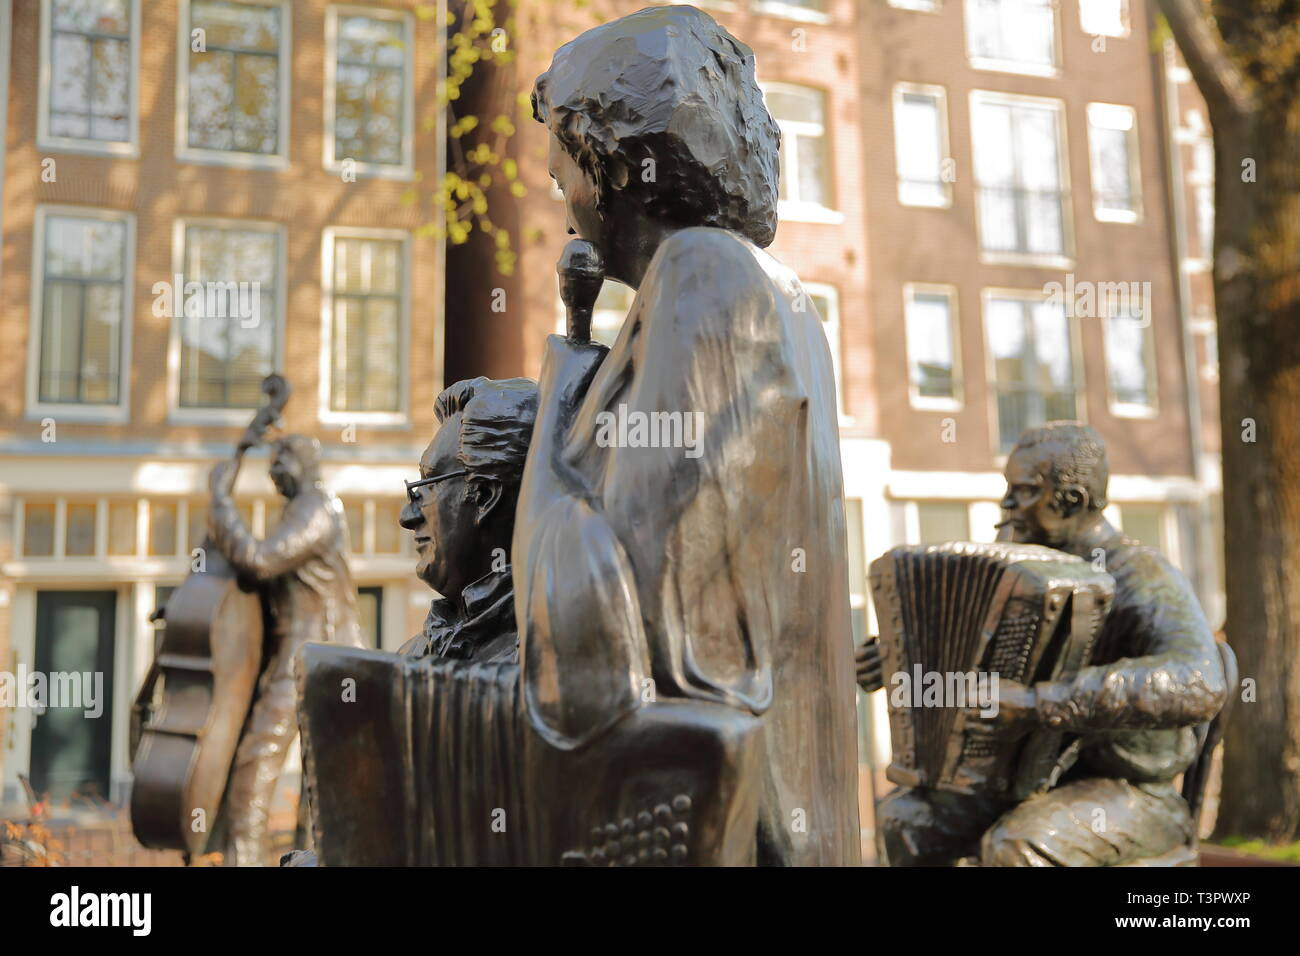 AMSTERDAM, NETHERLANDS - APRIL 05, 2019: Bronze Sculpture of famous Dutch singer Jan Froger, located on Elandsgracht (close to Prinsengracht canal) - Stock Image